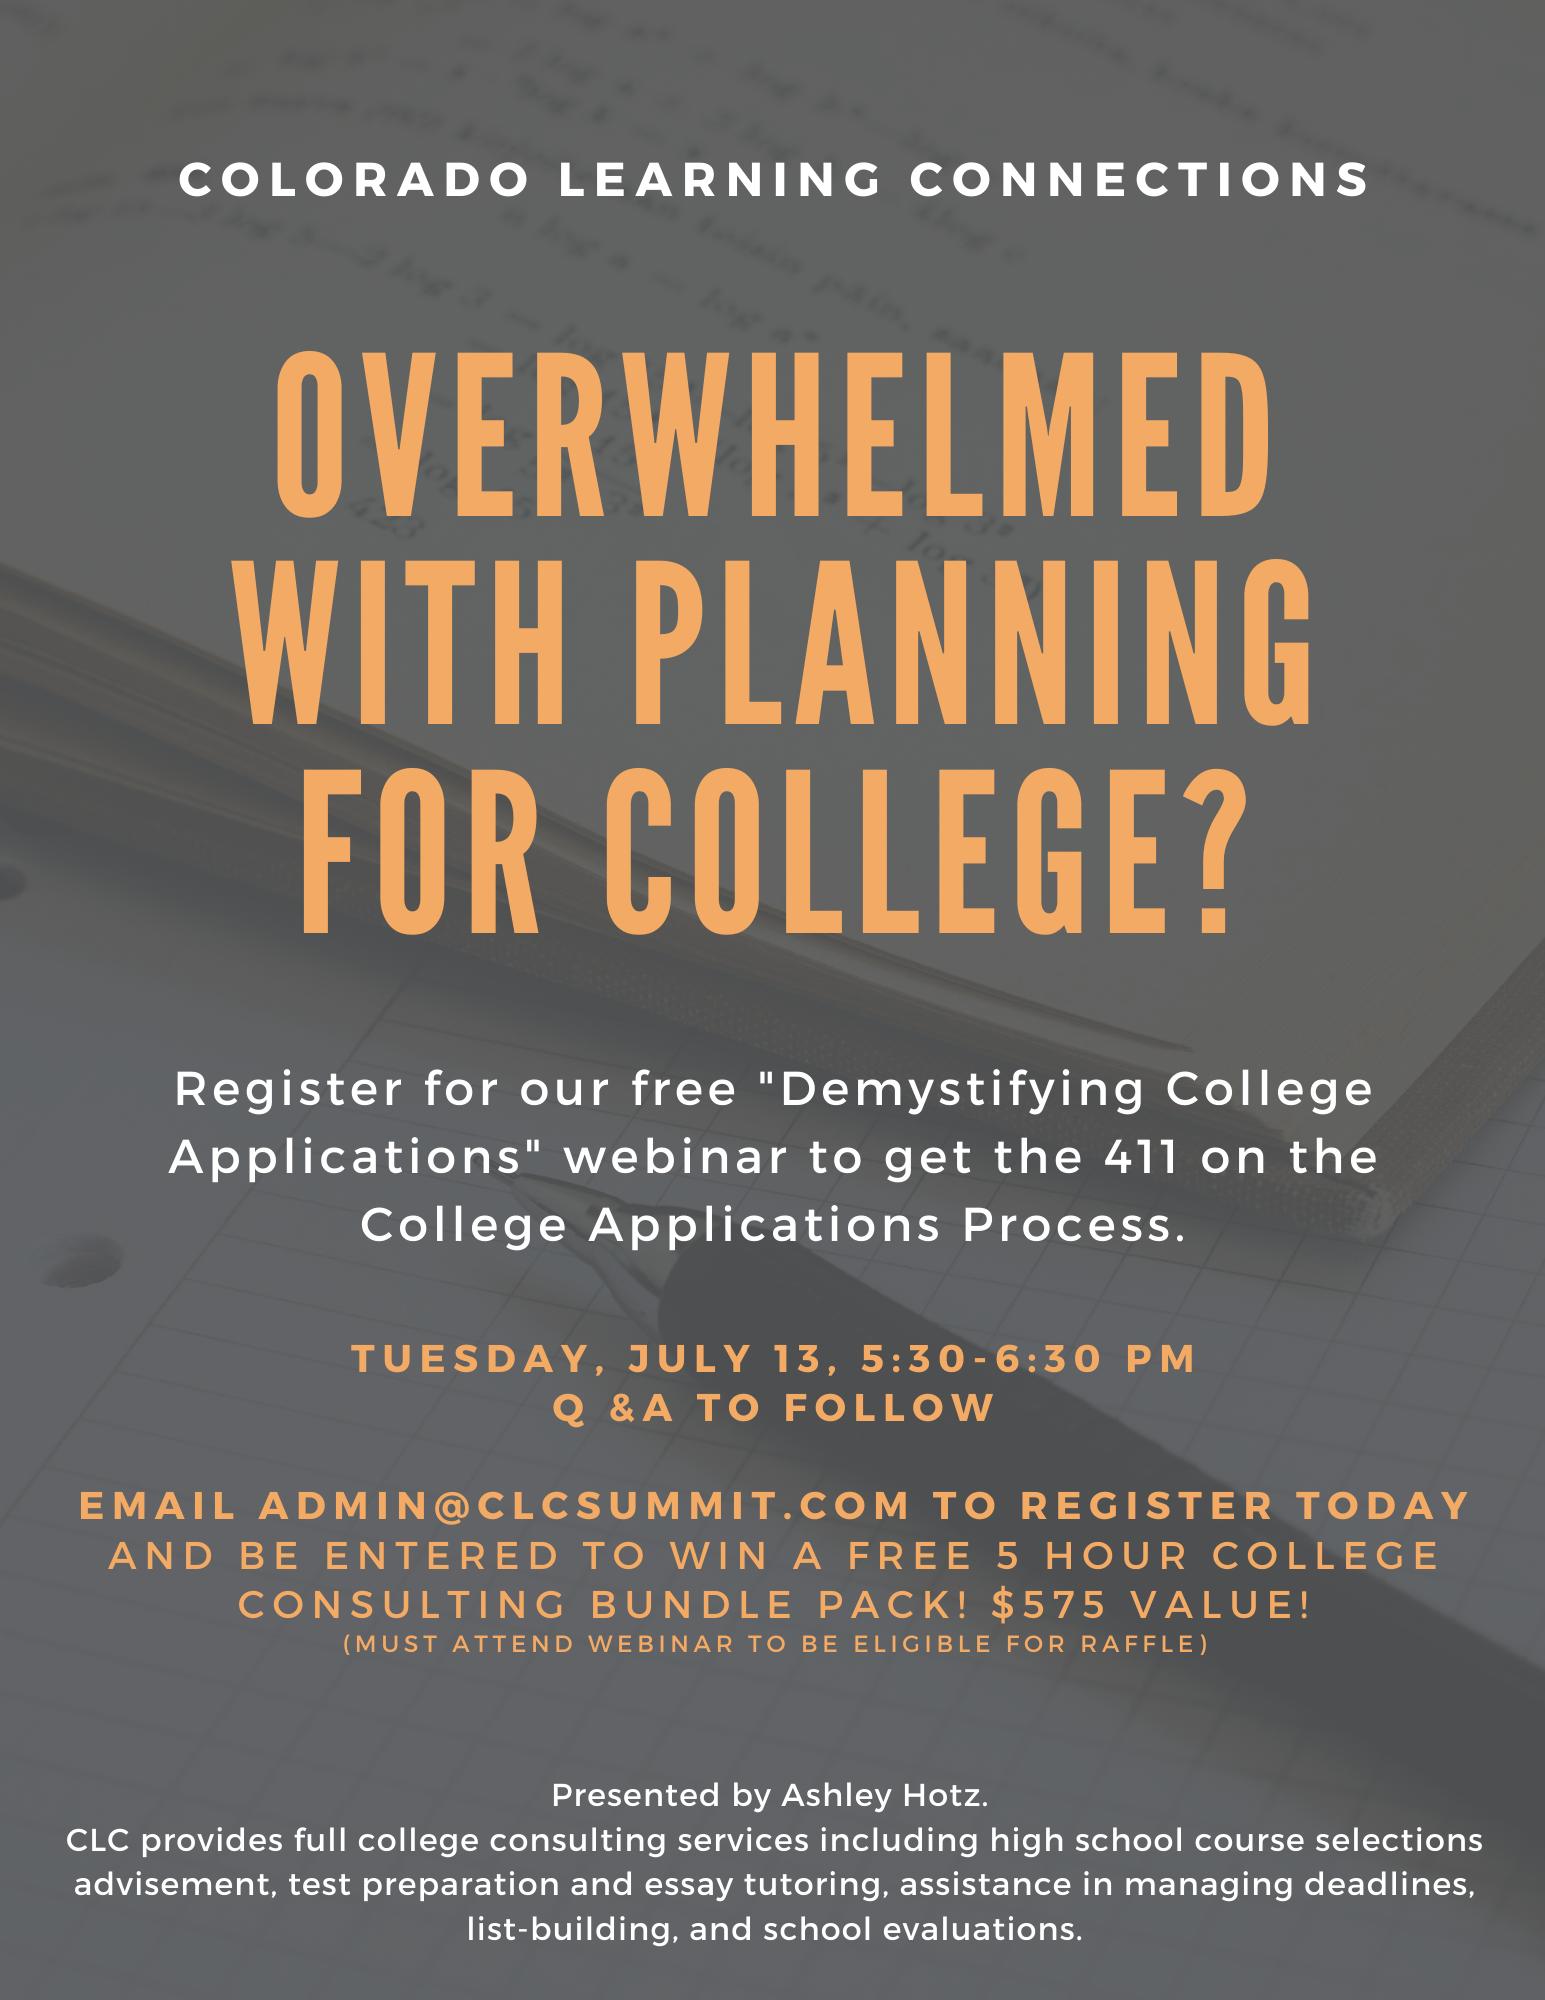 College Application Webinar 2021